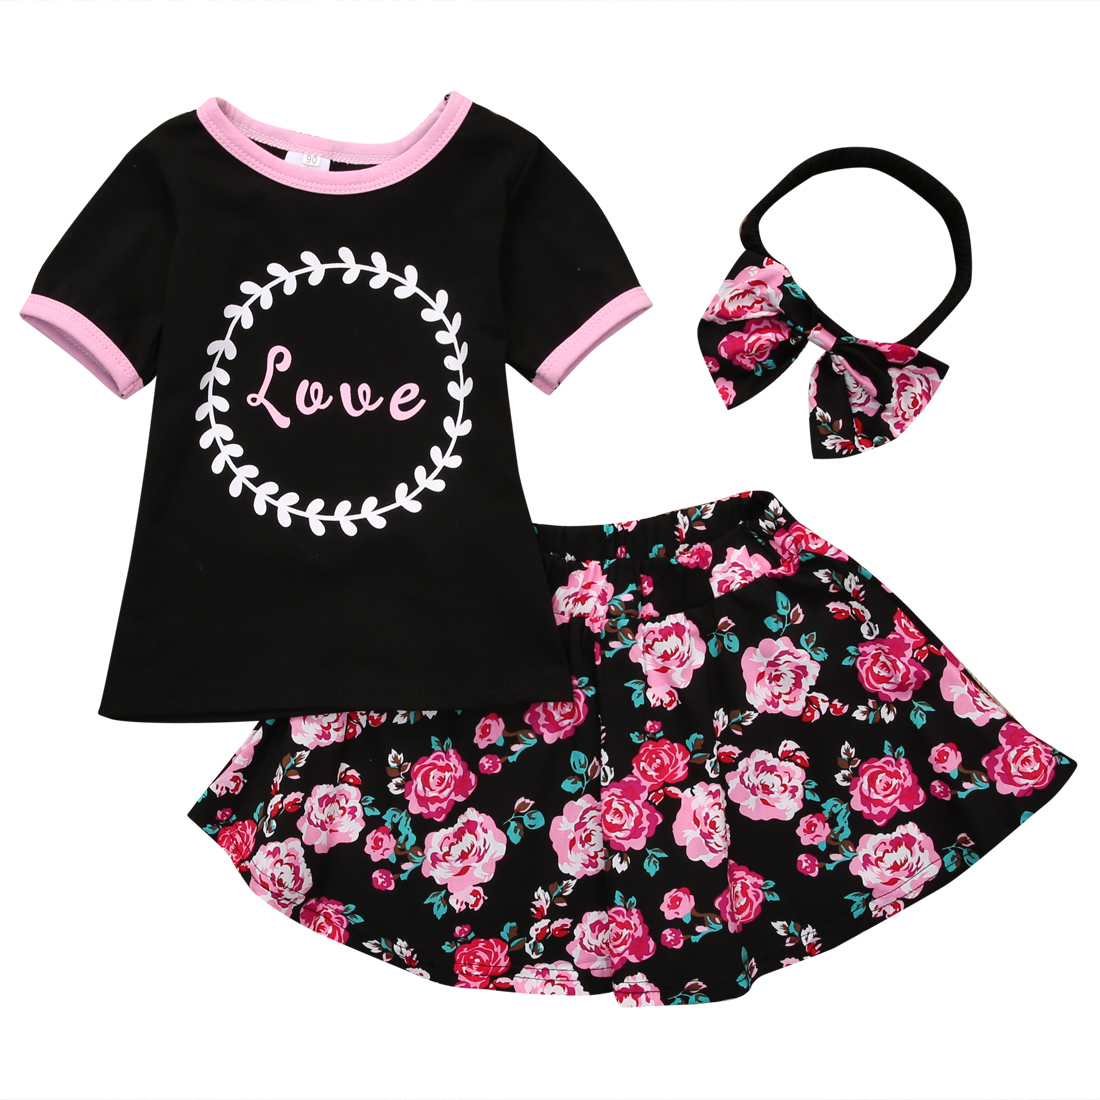 3 pc Set Baby Girl Clothes Set Bowknot Headband + Letter Print T-shirt Tops + Flower Dress Skirt Pants Outfits цена 2017